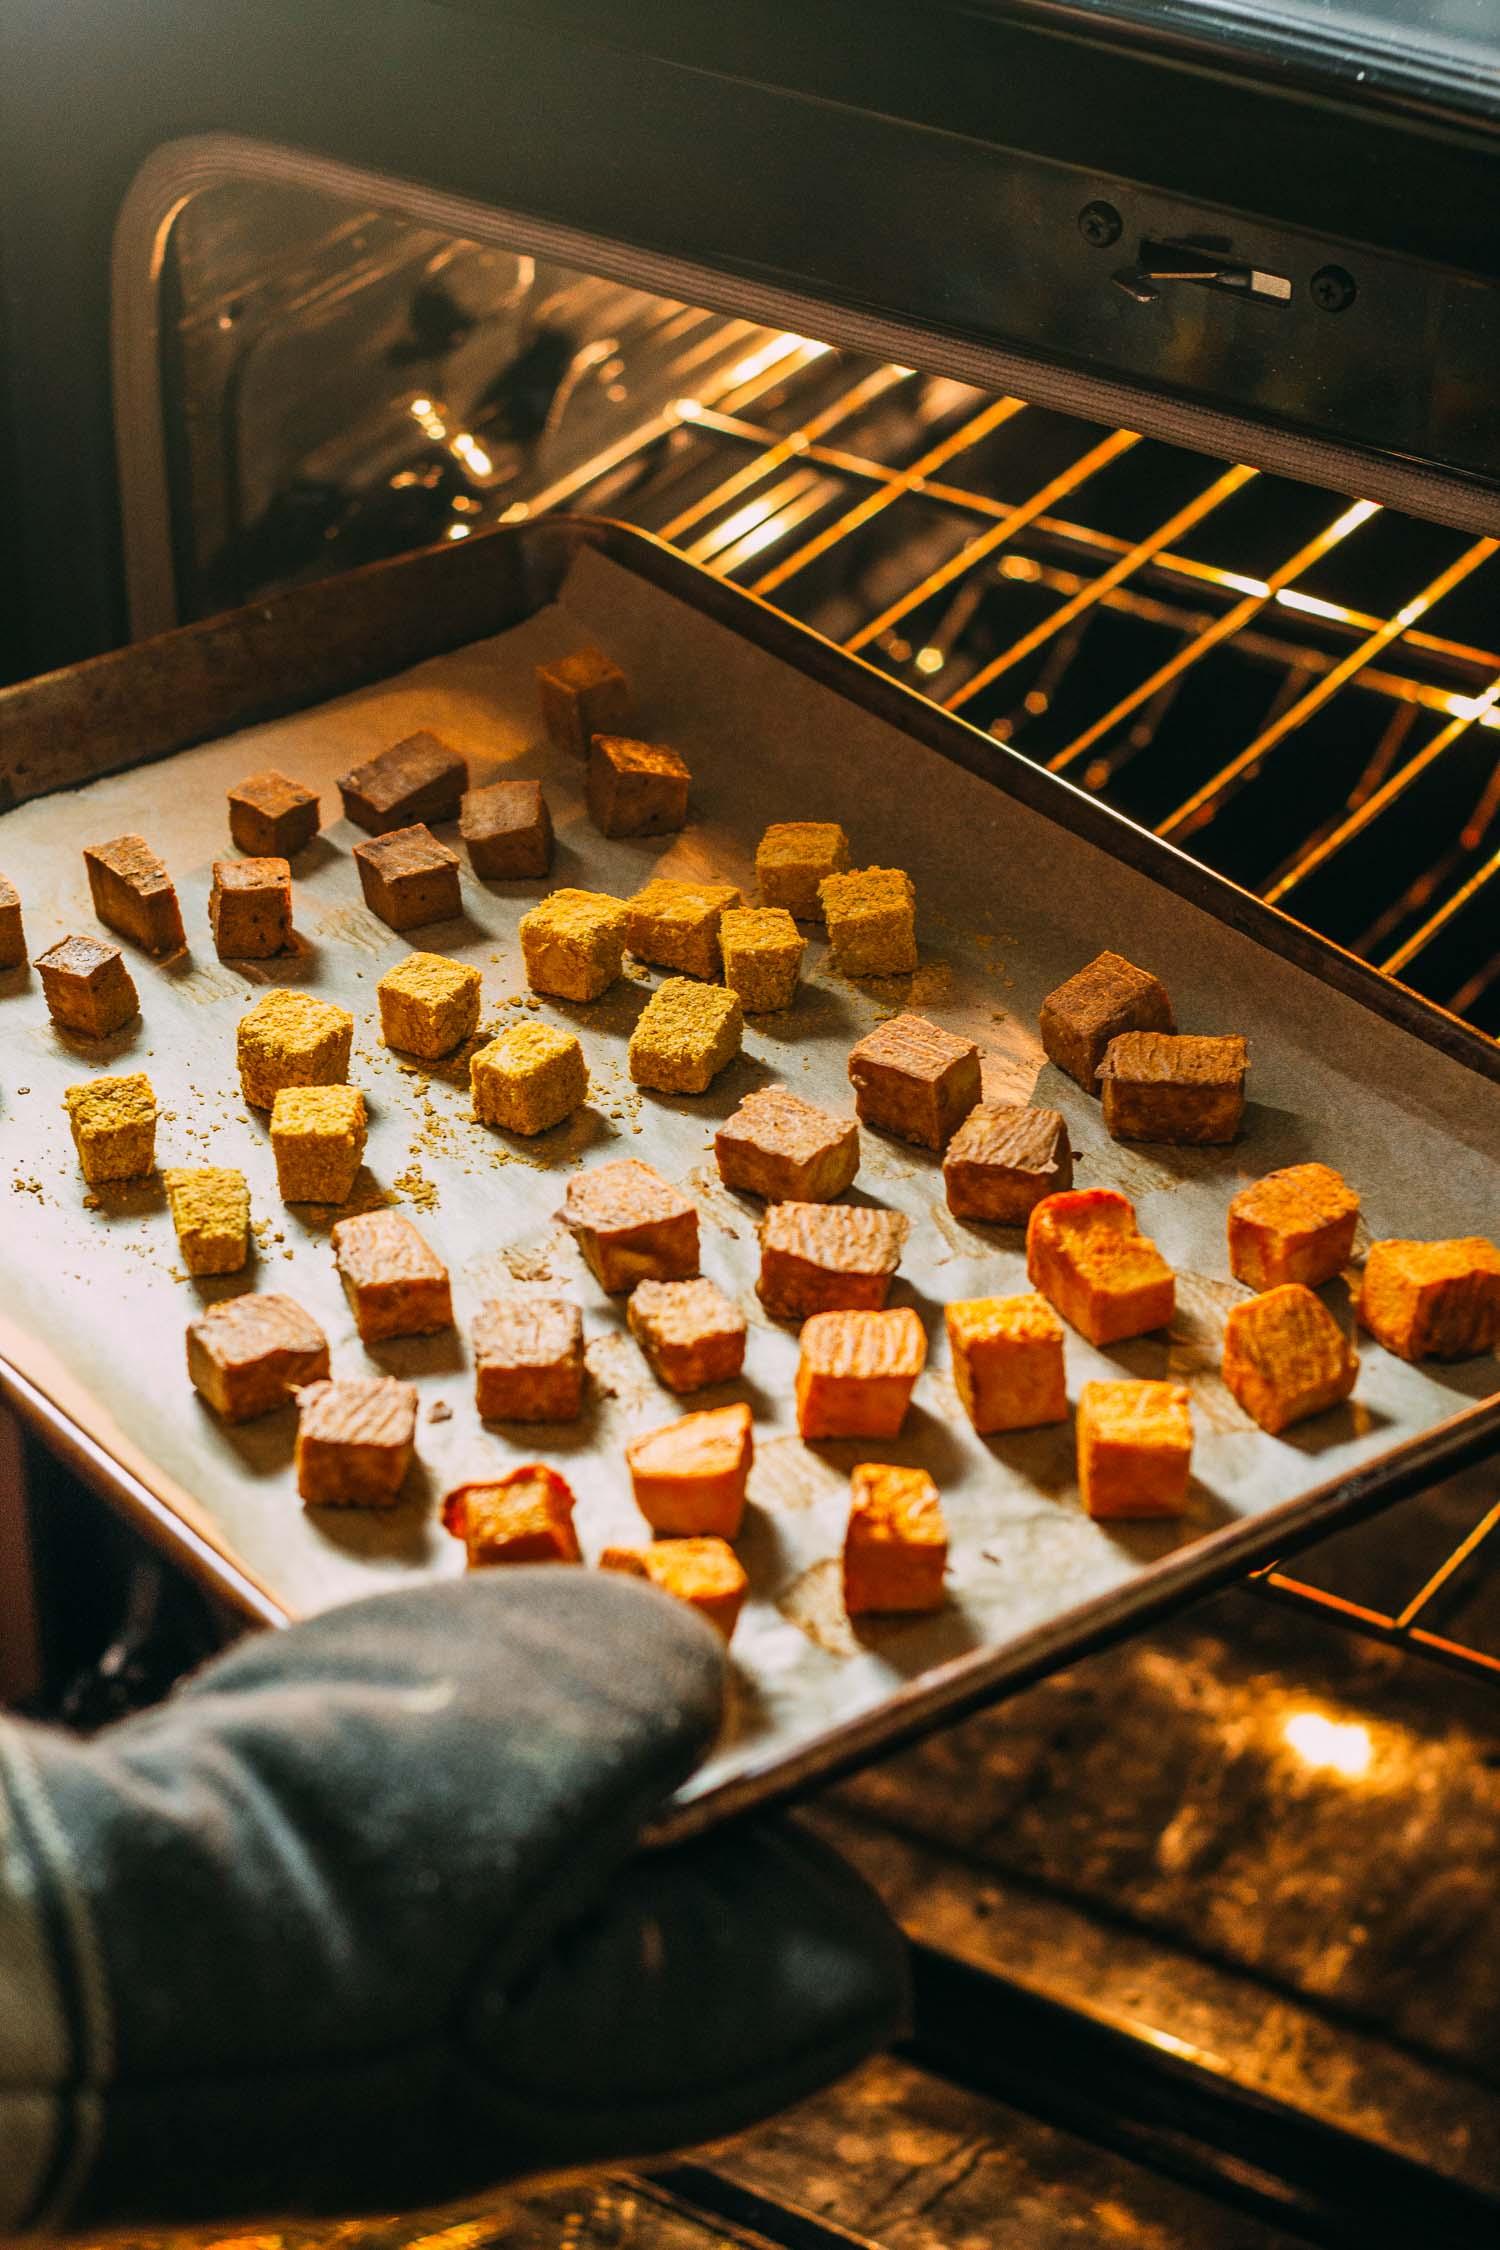 Savory Oil-Free Baked Tofu - Four Ways #tofu #baked #appetizer #snack #entree #recipe #plant-based #vegan #oil-free #protein #vegetarian #buffalo #liquid aminos #nutritional yeast #recipes #thai #asian #wfpbno #wfpb #meatless #Monday